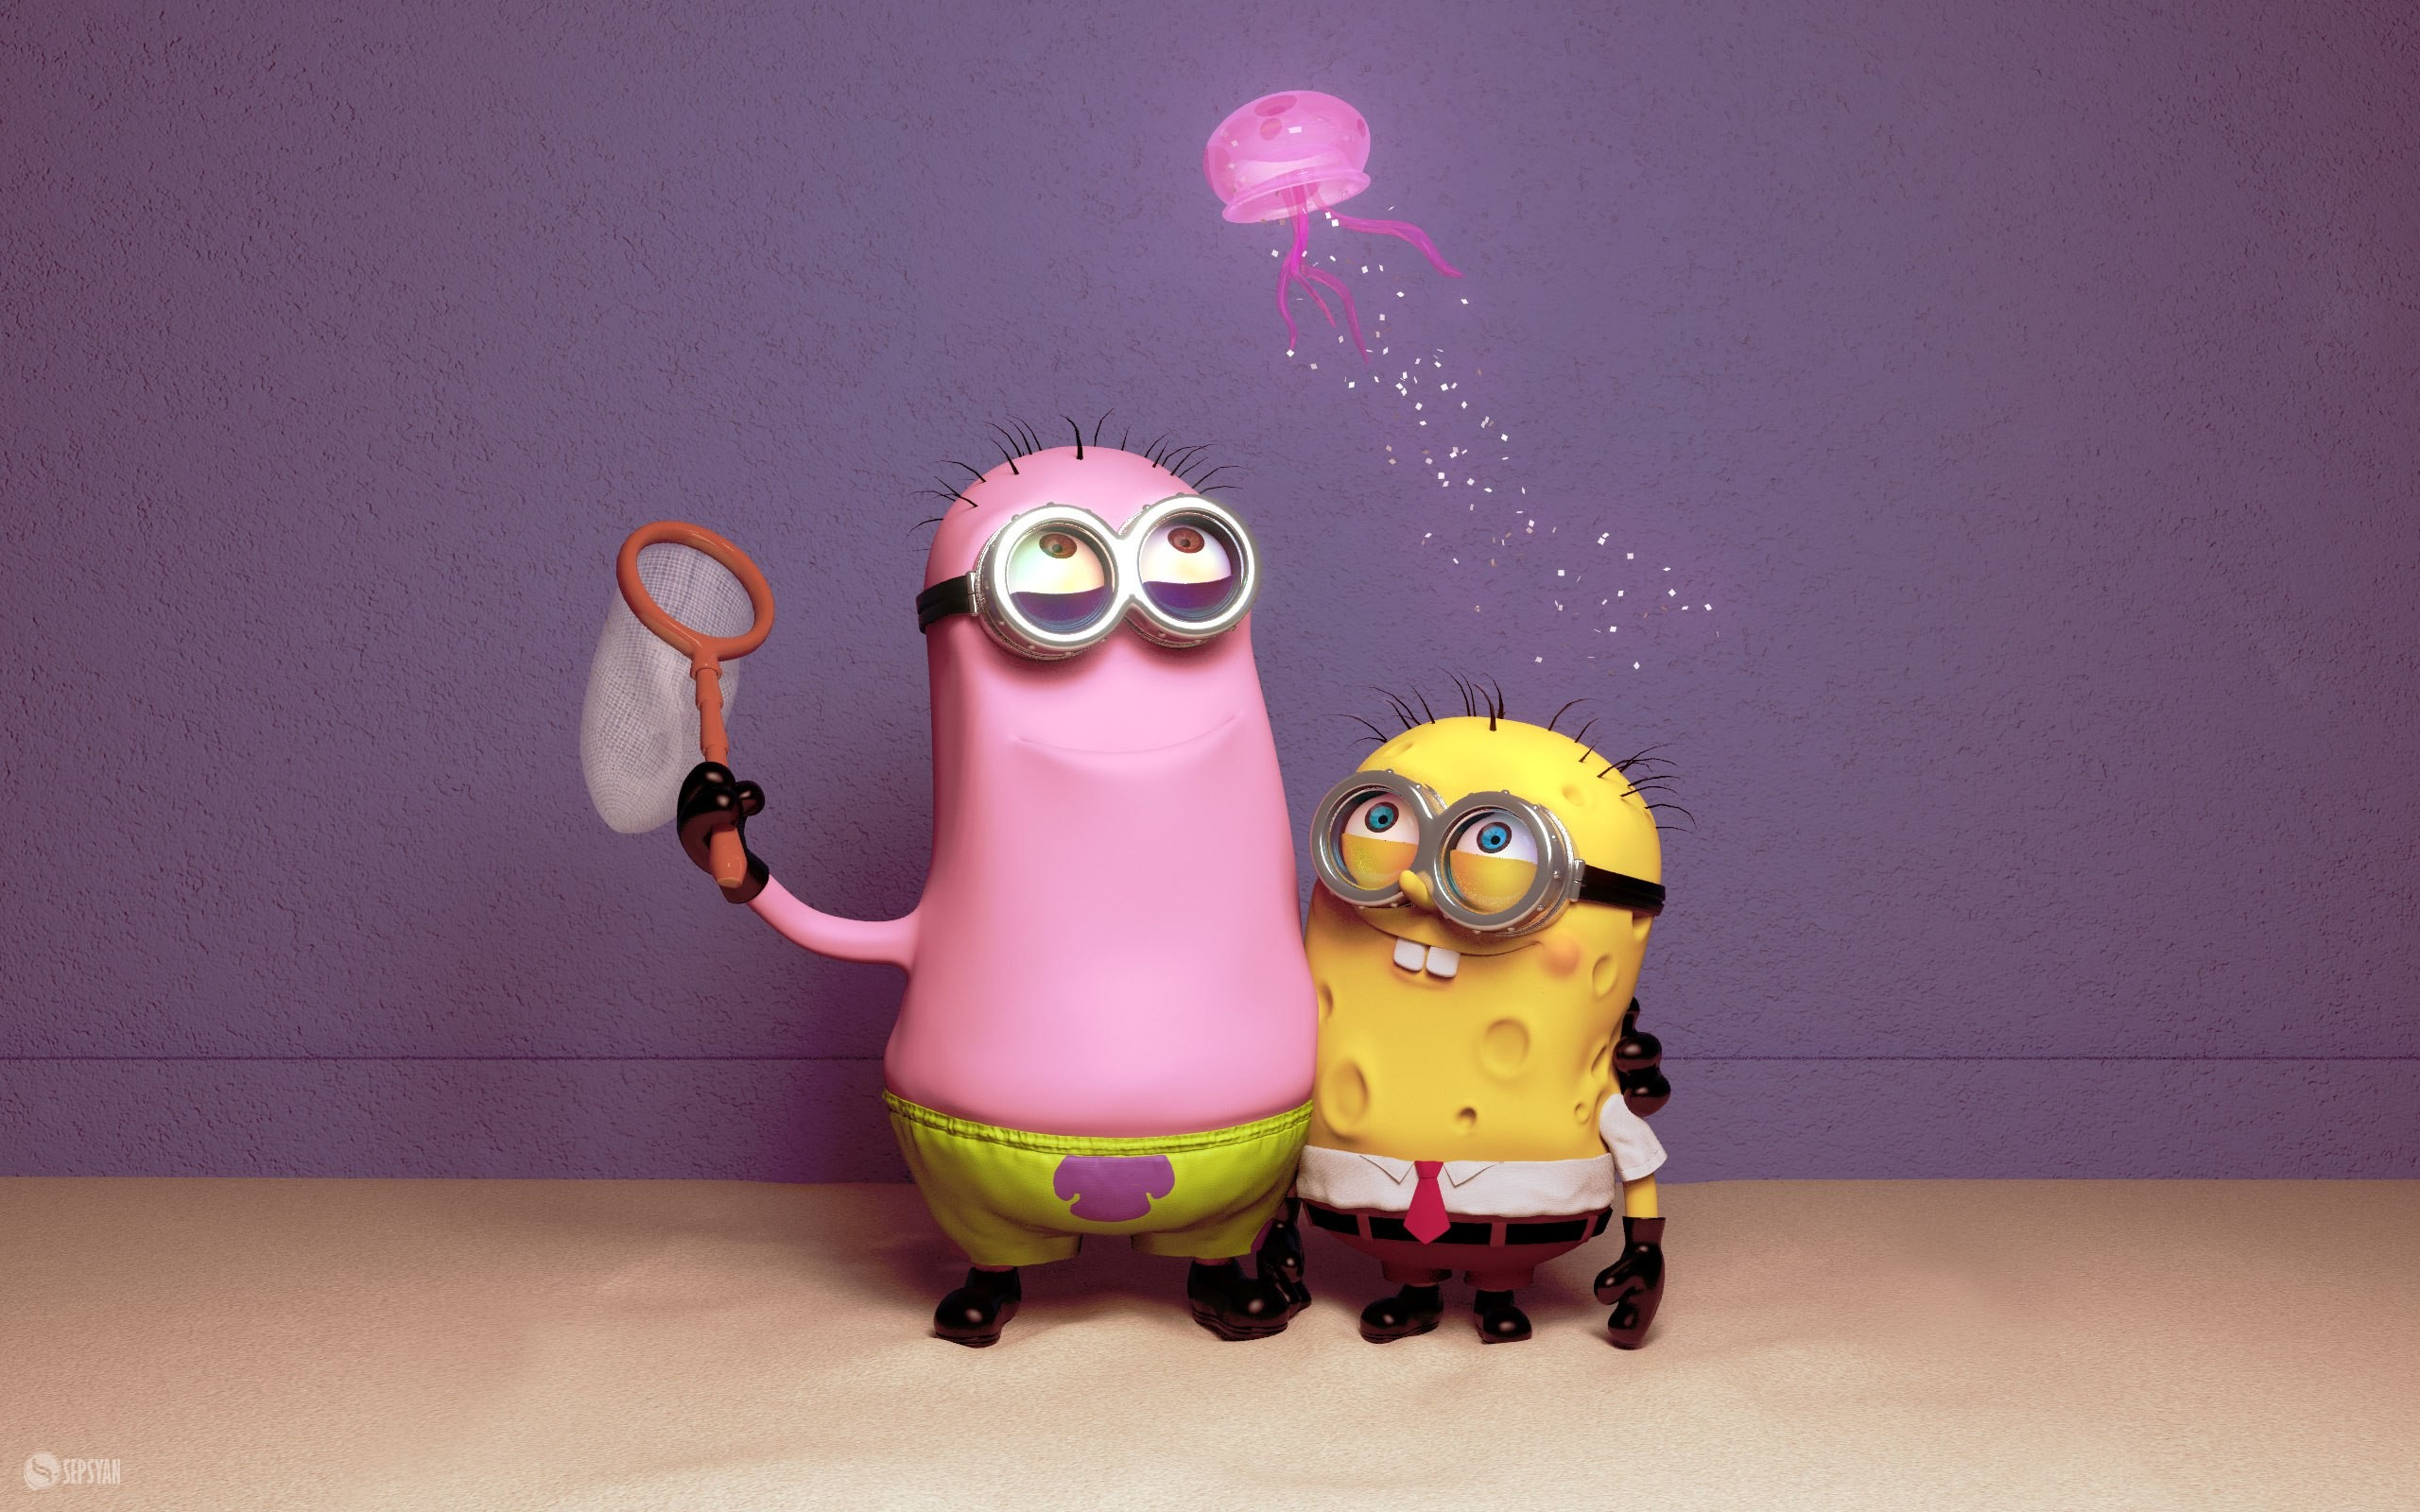 Funny-Minion-Wallpaper-Spongebob-and-Patrick